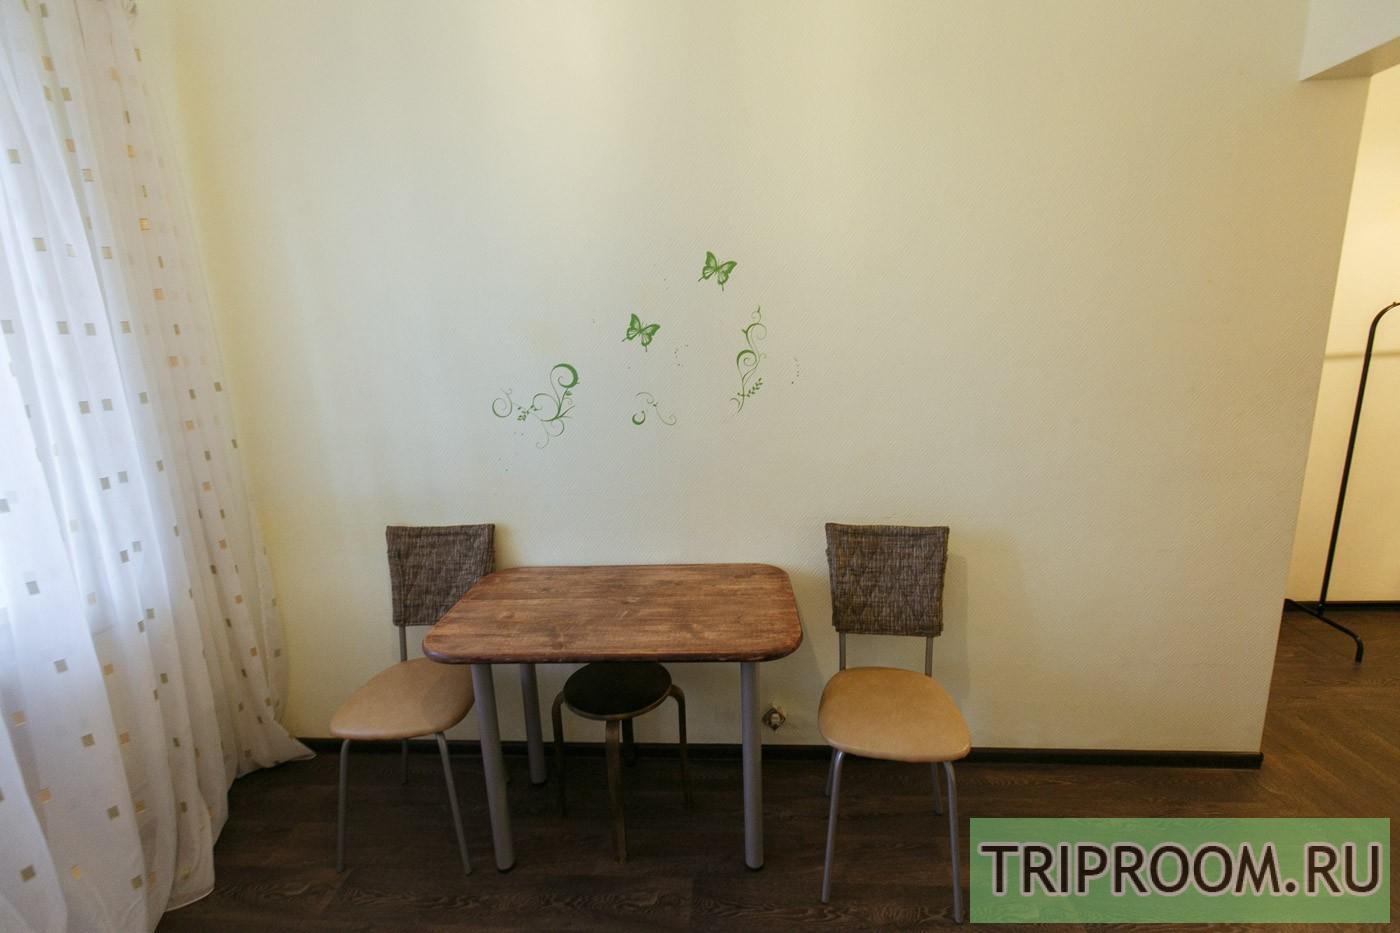 1-комнатная квартира посуточно (вариант № 28539), ул. П.И. Смородина, фото № 7